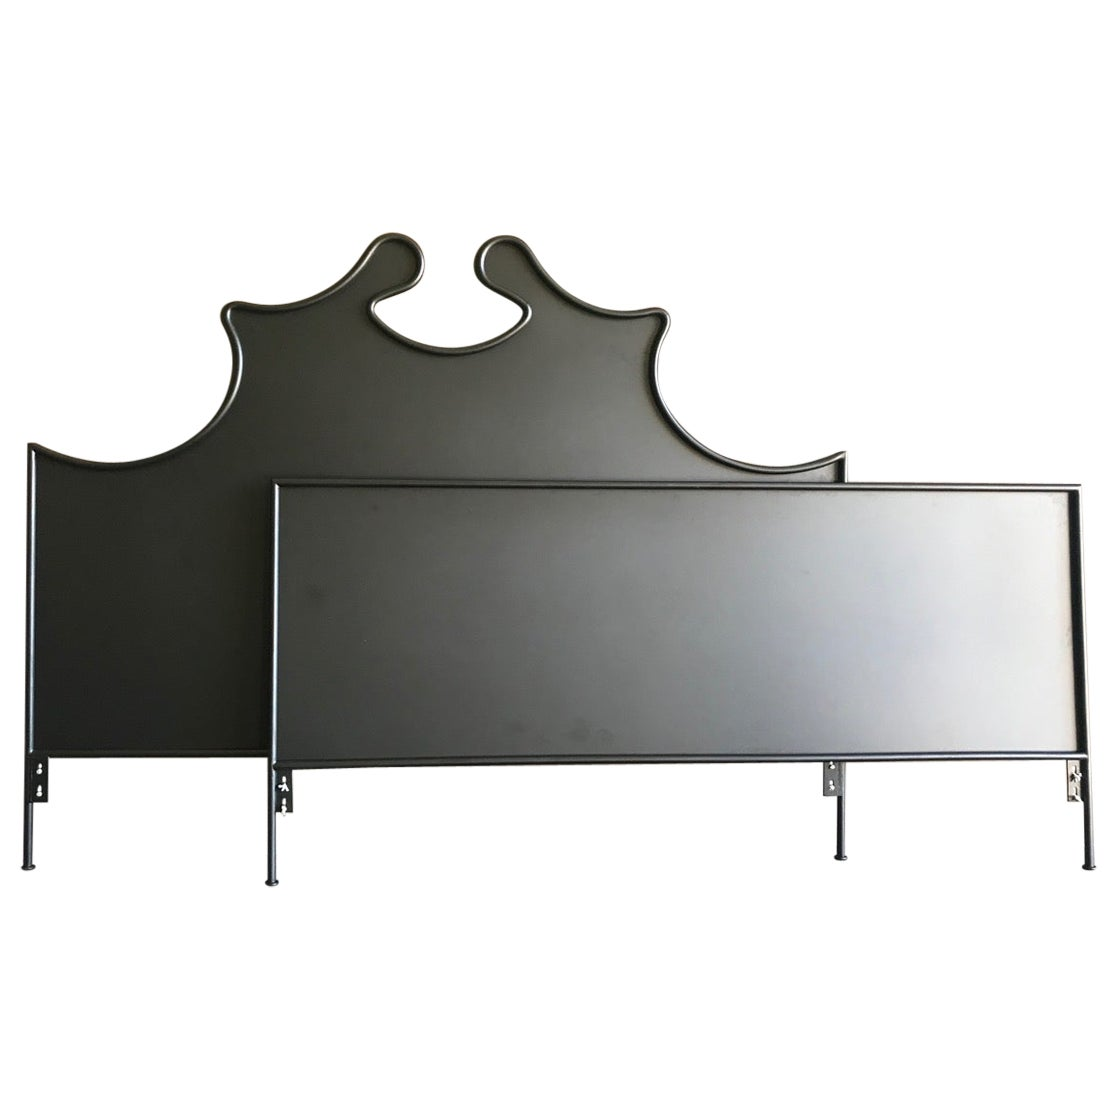 Iron Louis XV Style Headboard with Footboard, King